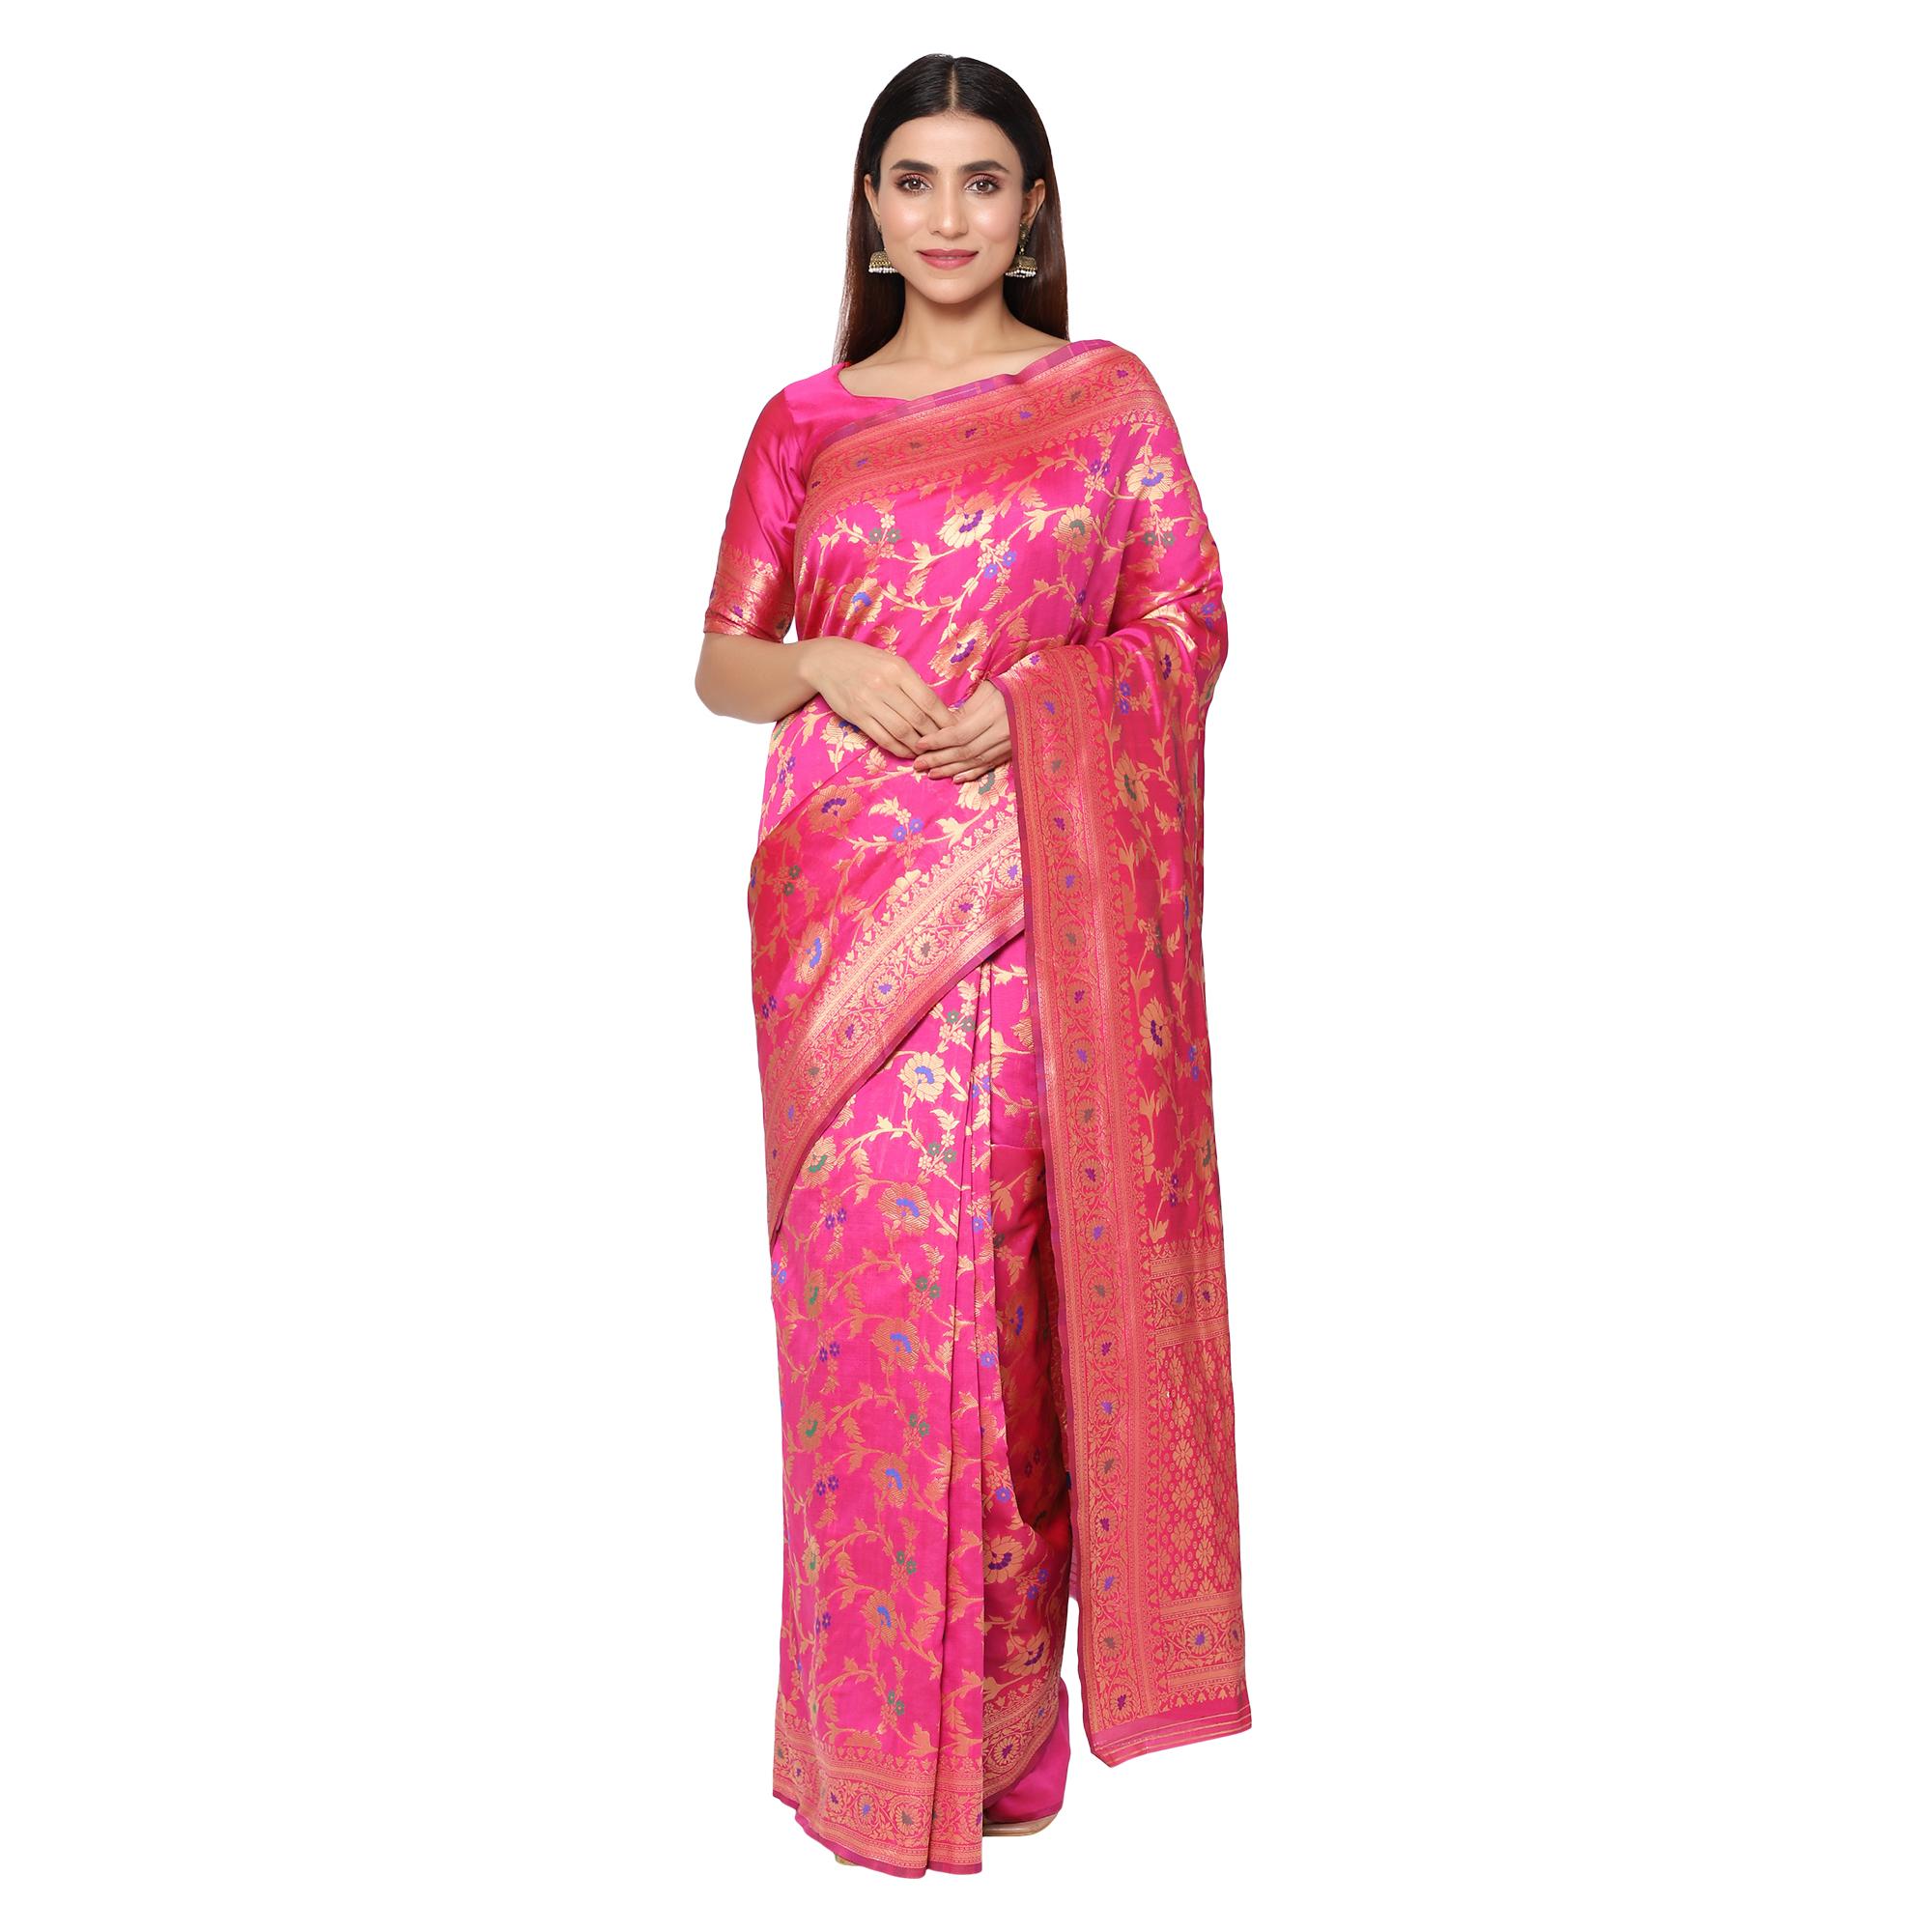 Glemora | Glemora Pink Beautiful Ethnic Wear Silk Blend Banarasi Traditional Saree